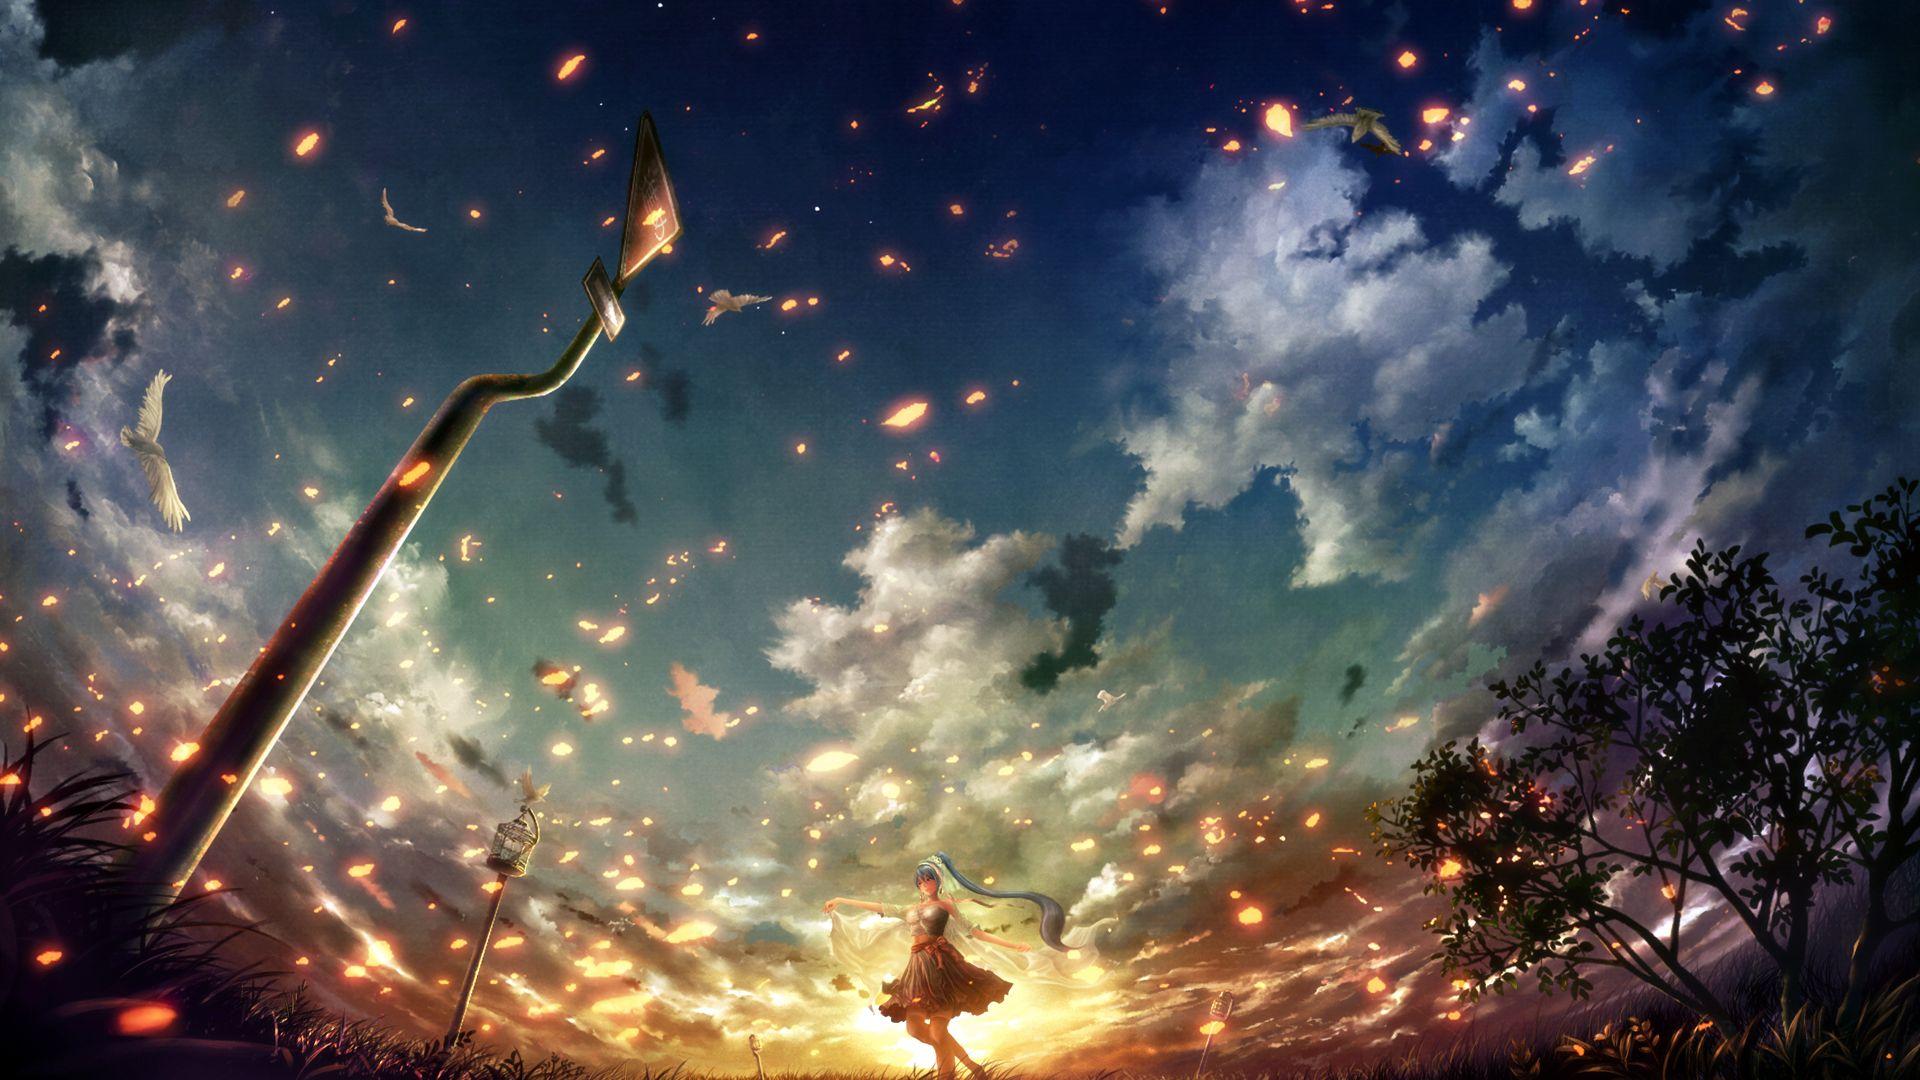 Anime Birds In The Sky